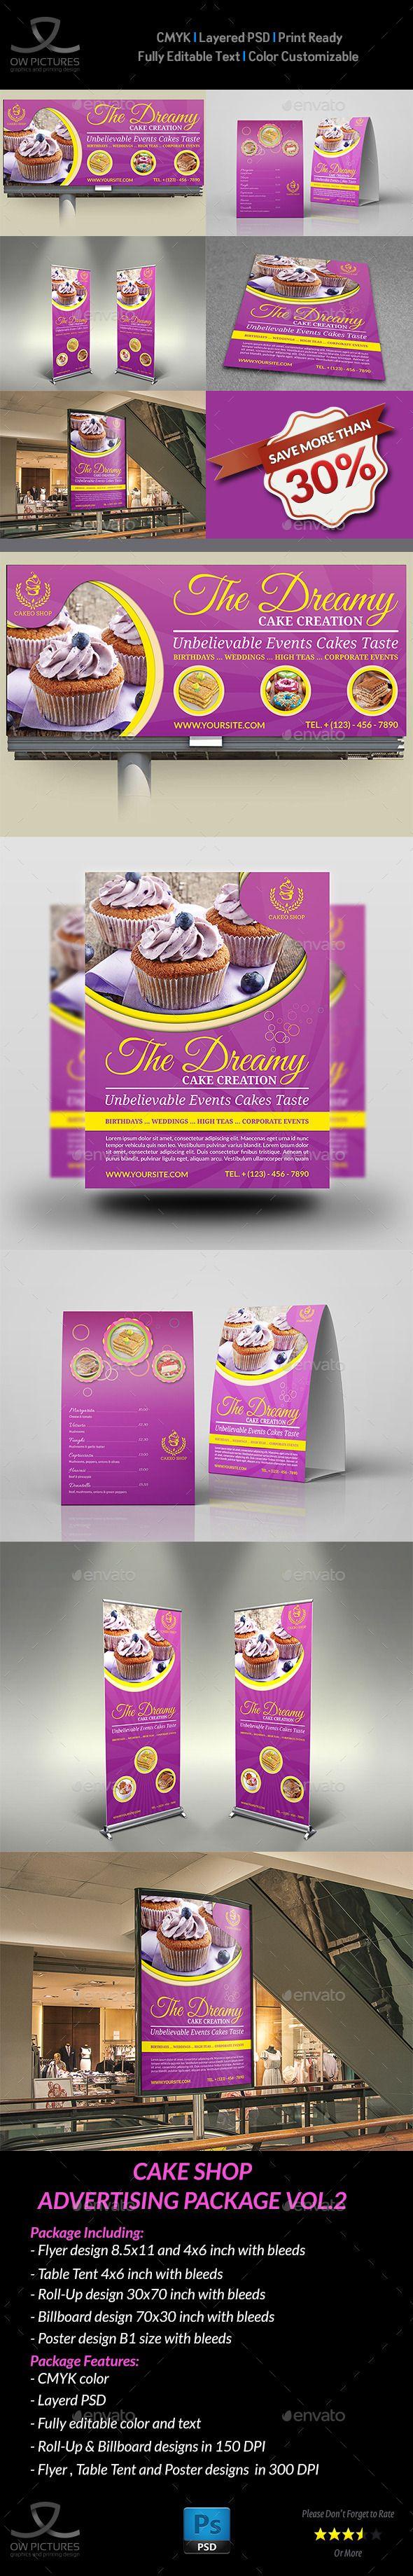 8 5x11 poster design - Cake Shop Advertising Bundle Vol 2